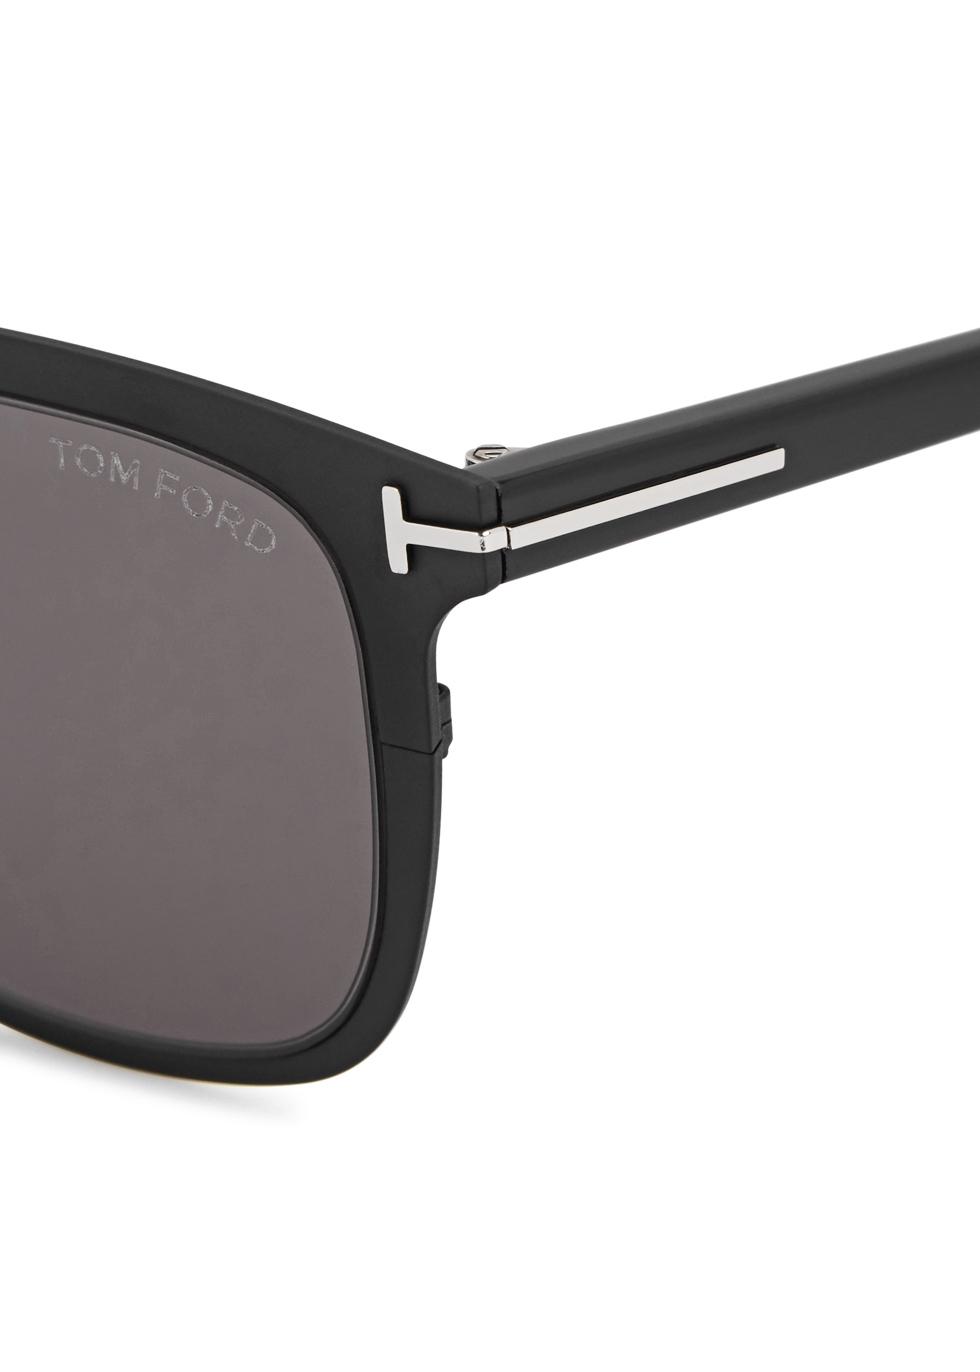 Alasdhair wayfarer-style sunglasses - Tom Ford Eyewear